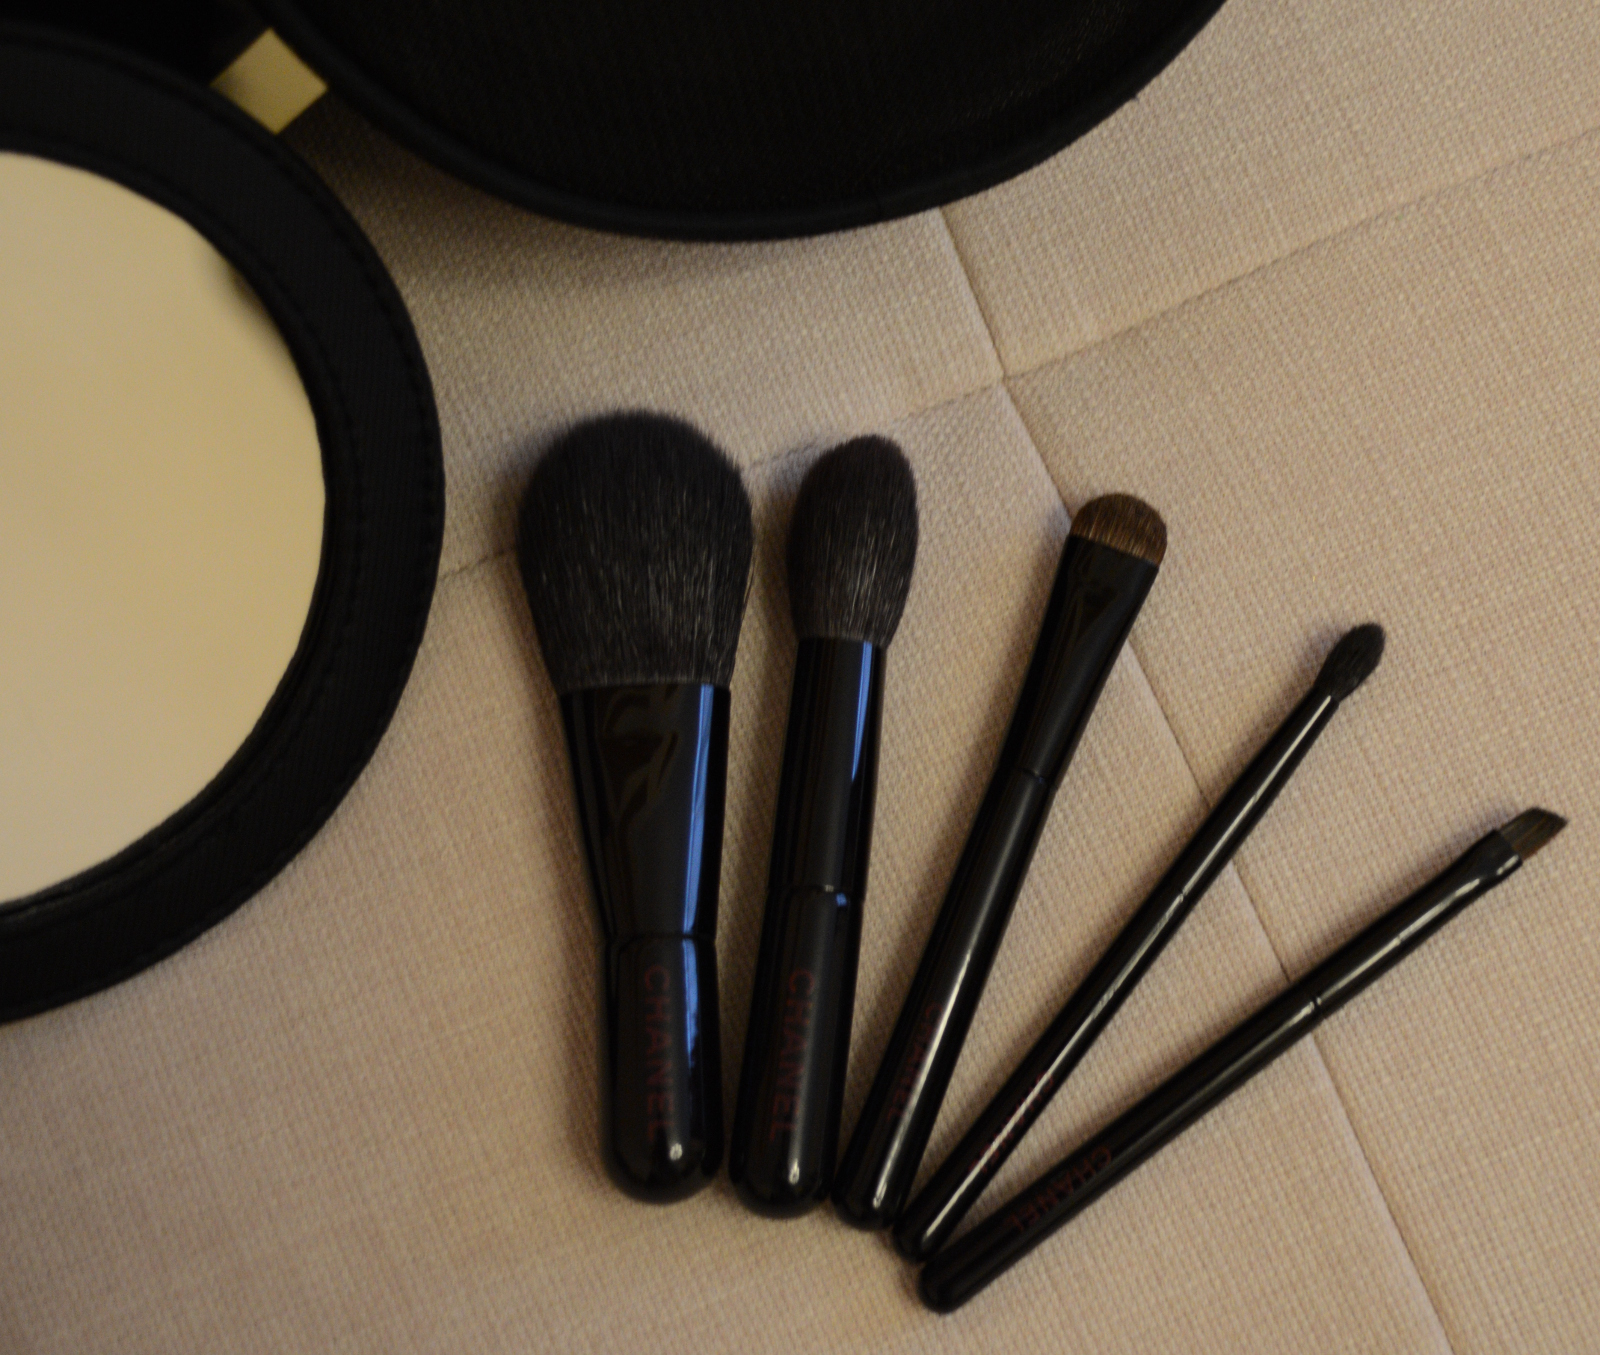 Кисти шанель для макияжа 7 шт фото